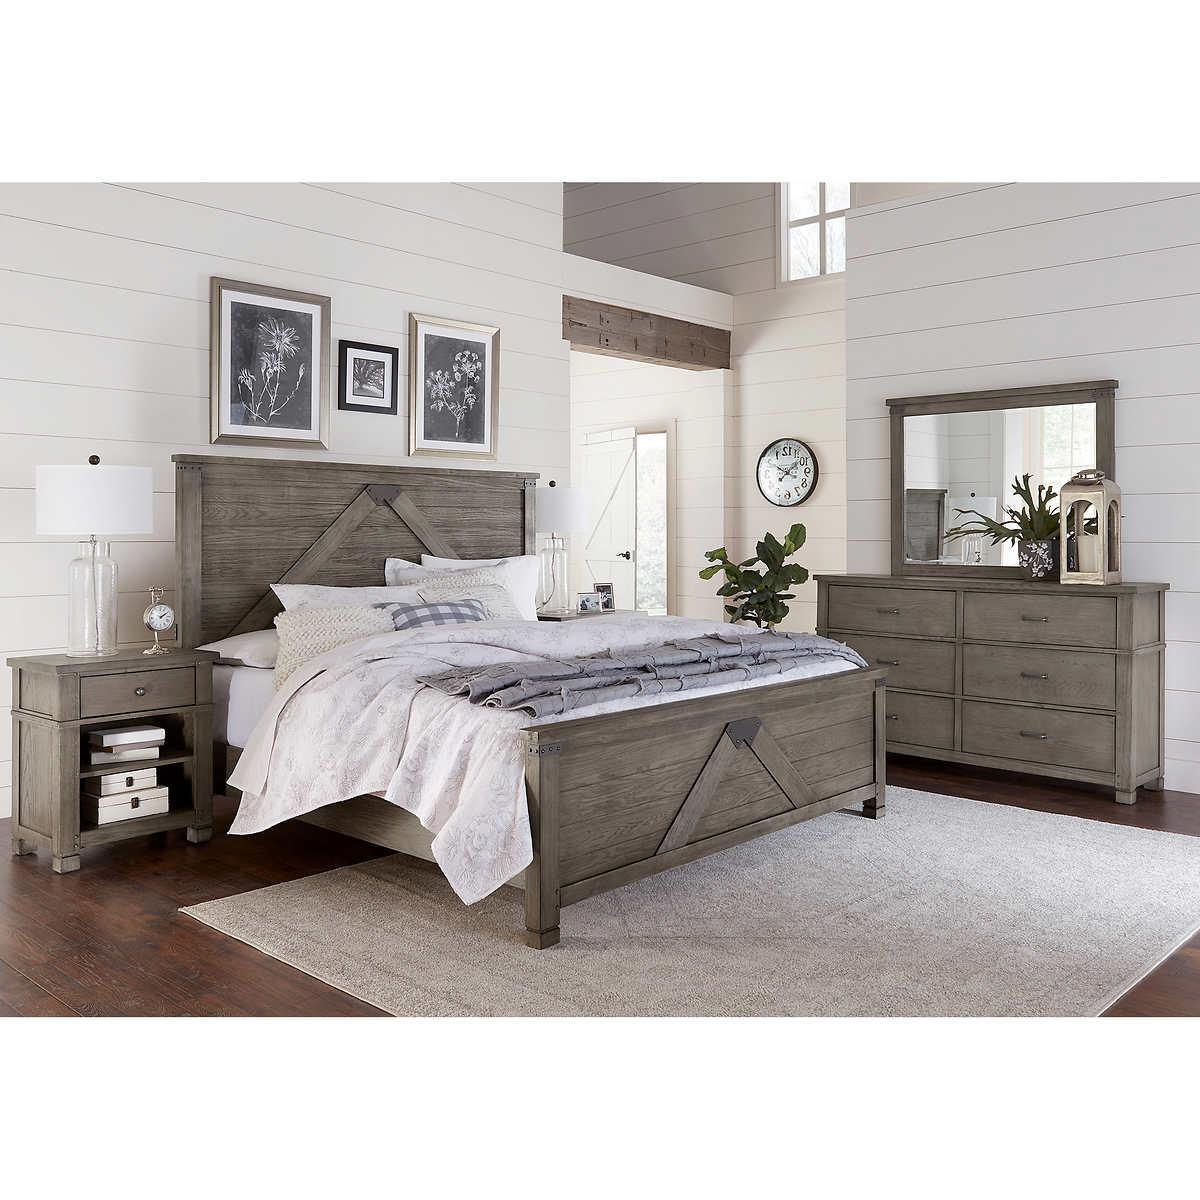 East Lake 5-piece King Bedroom Set